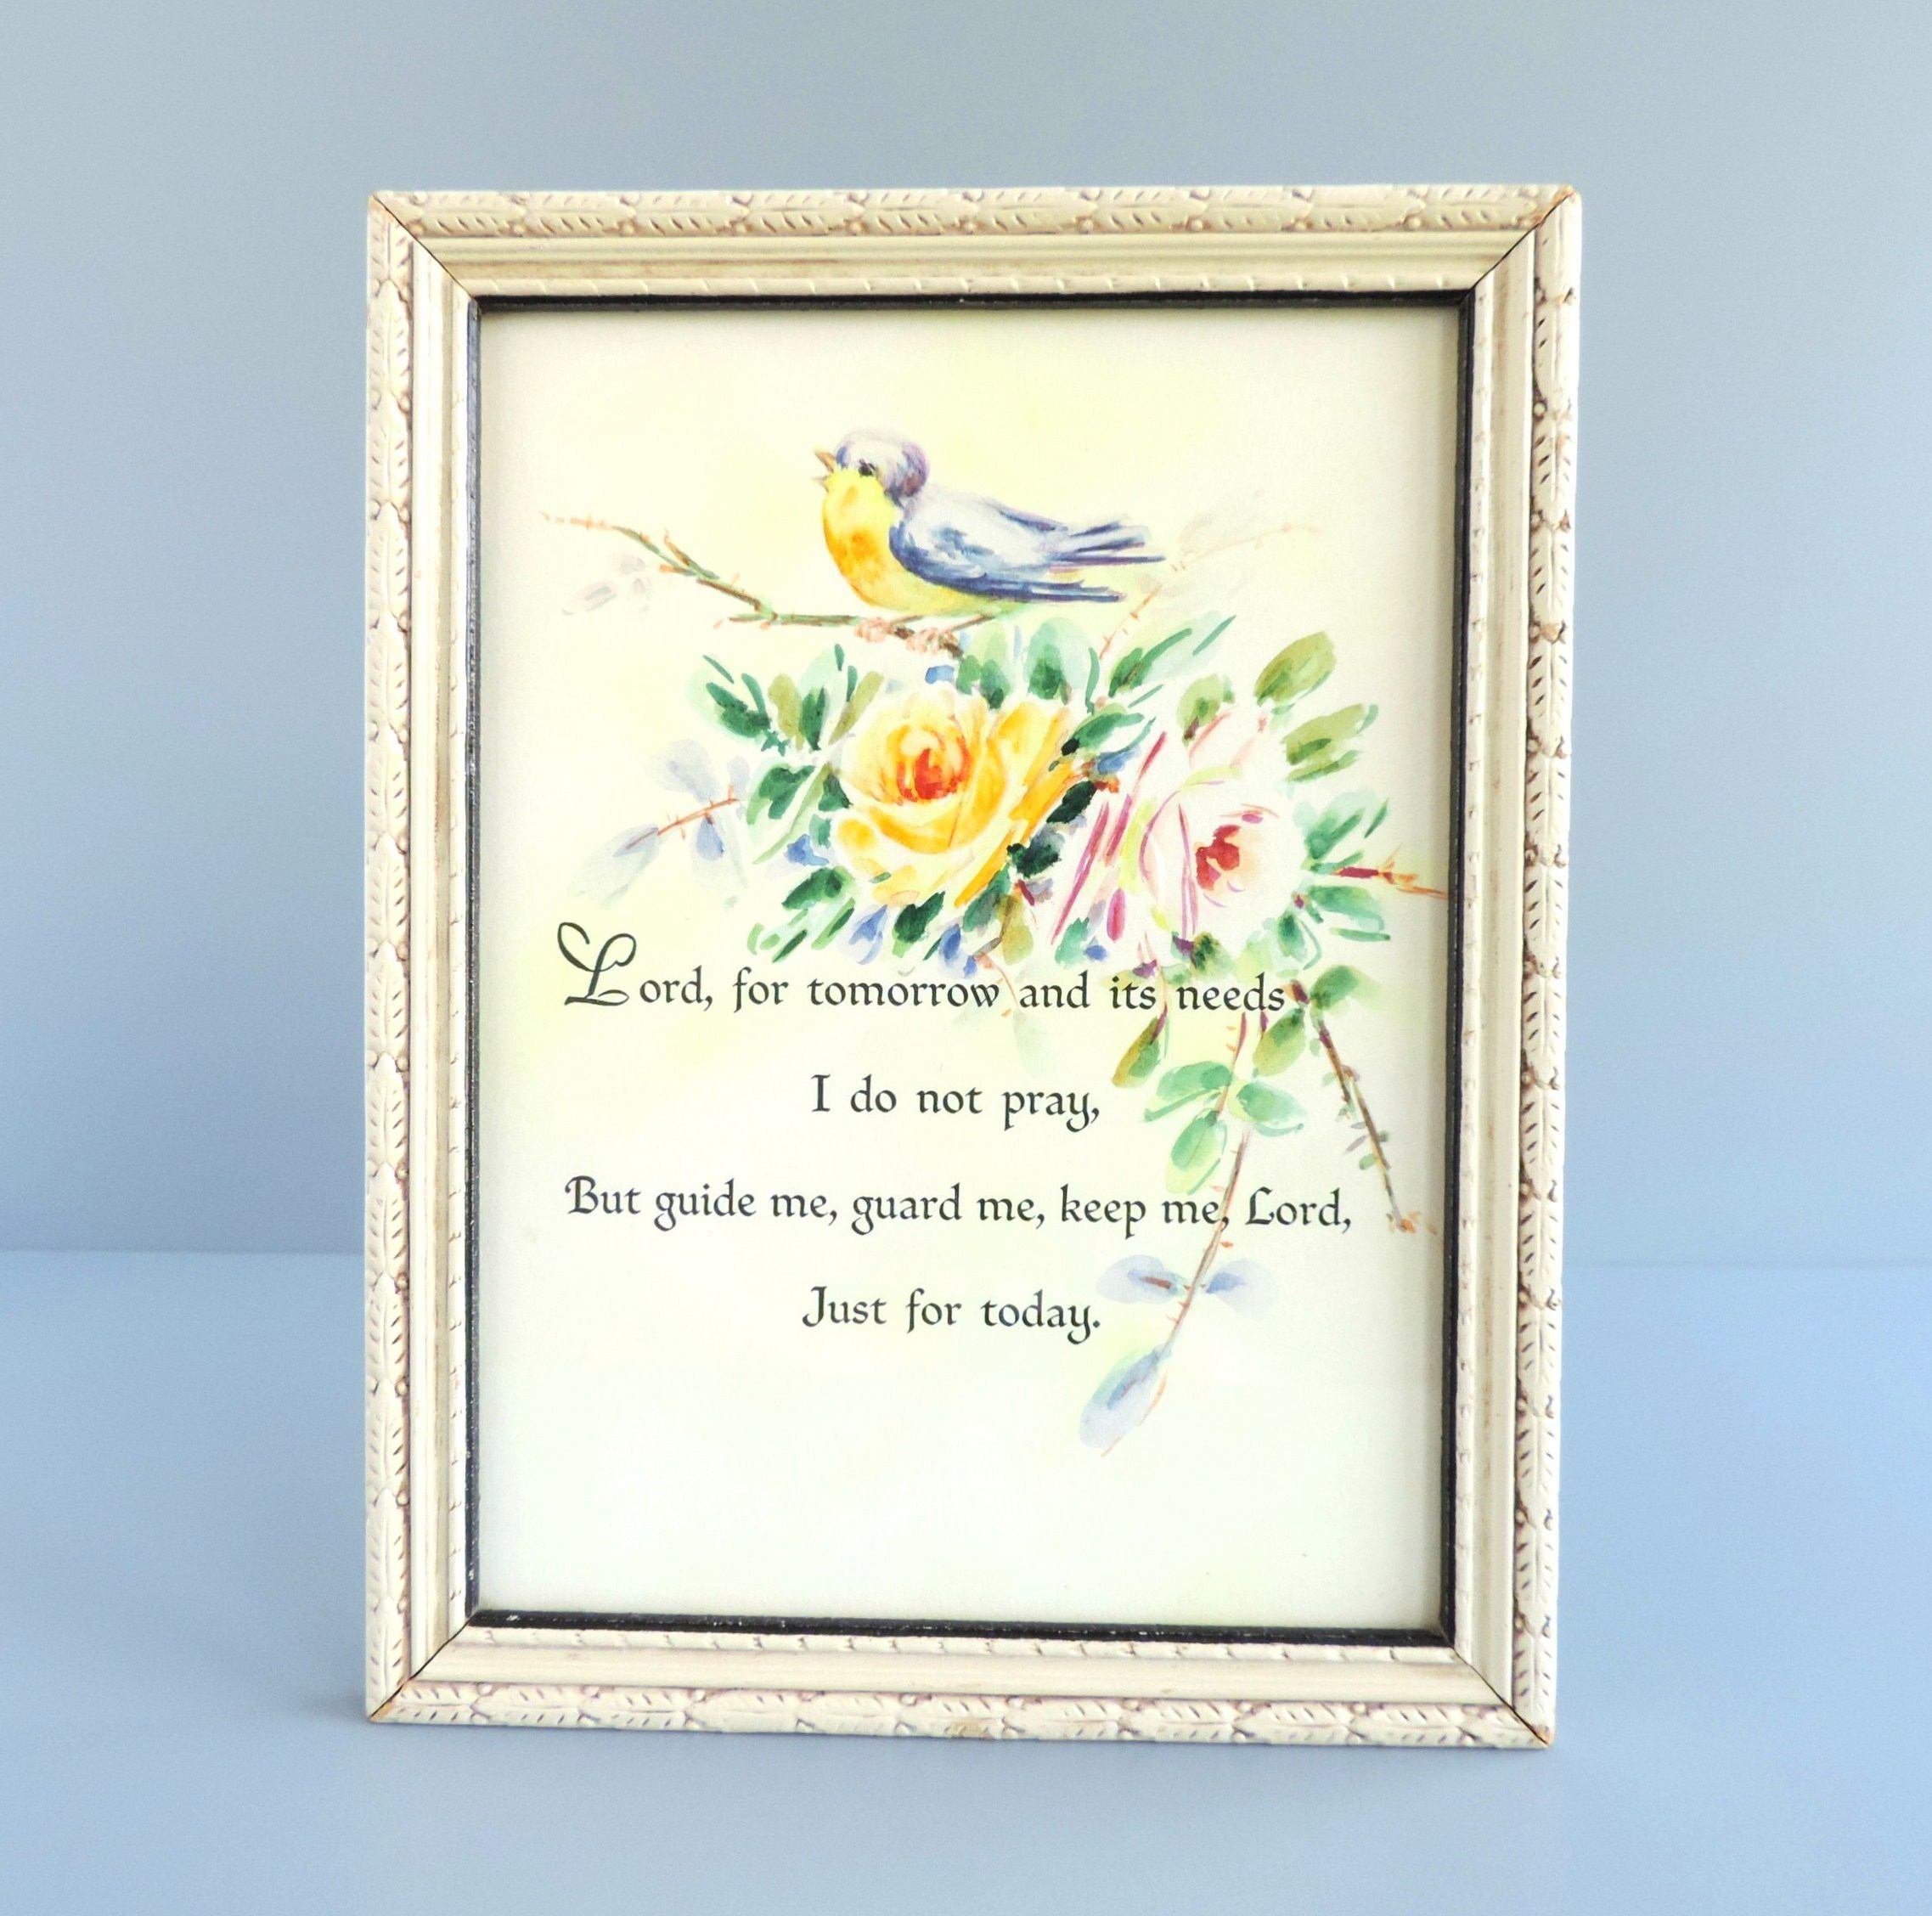 Vintage Framed Prayer Art Print With Bird And Rose Flowers